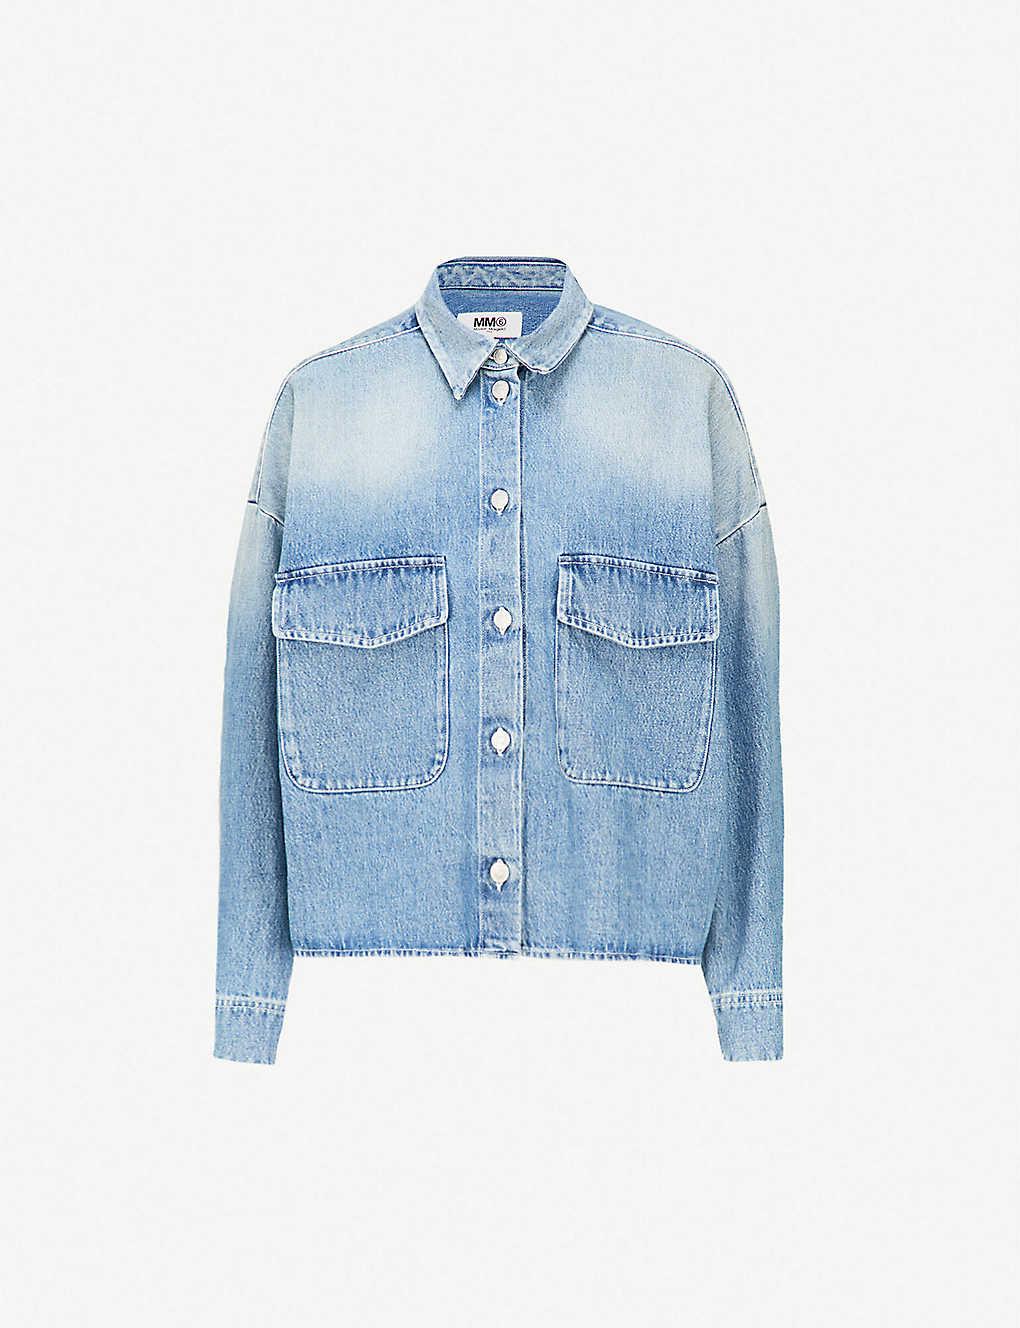 db3be6a1557 MM6 MAISON MARGIELA - Oversized faded denim shirt